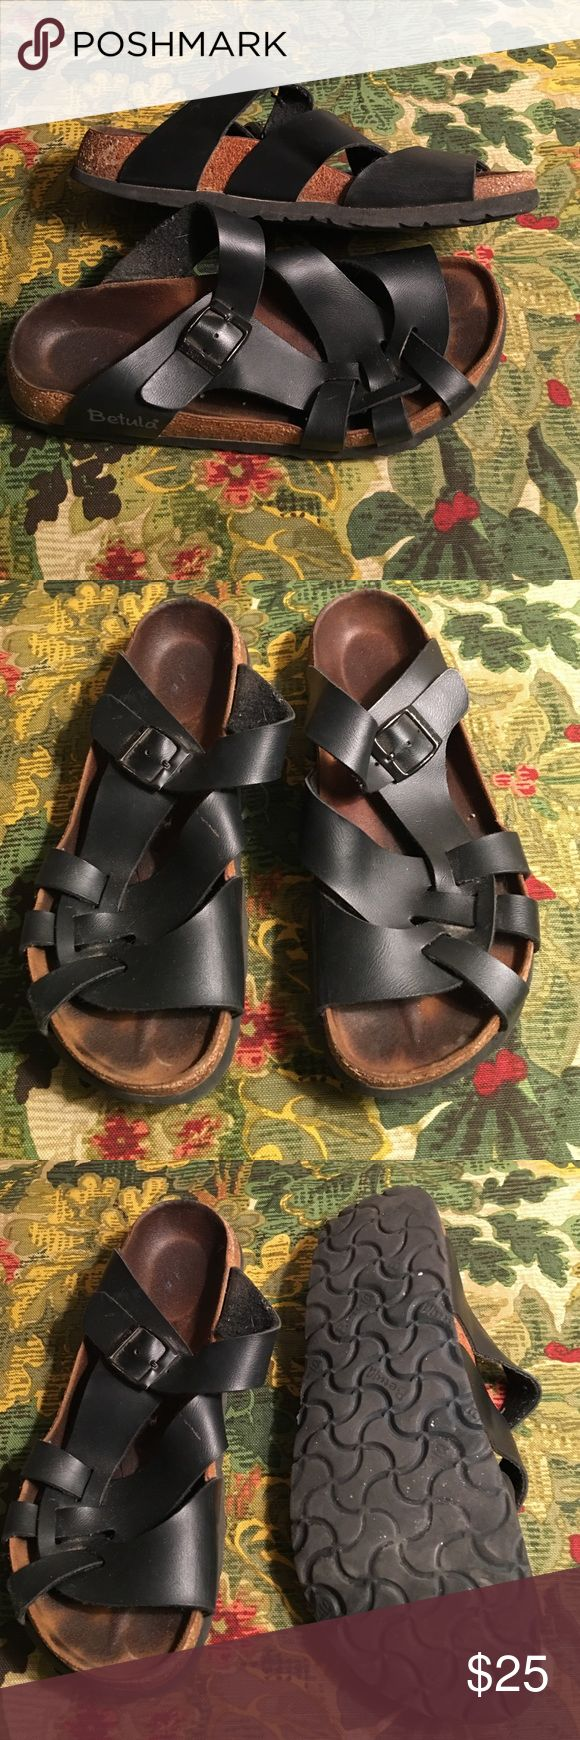 BIRKENSTOCK NARROW BETULA SANDALS 39 LADIES 8 PREOWNED GENTLY WORN BIRKENSTOCK BETULA BLACK STRAPPY SANDALS 39 LADIES 8 Birkenstock Shoes Sandals